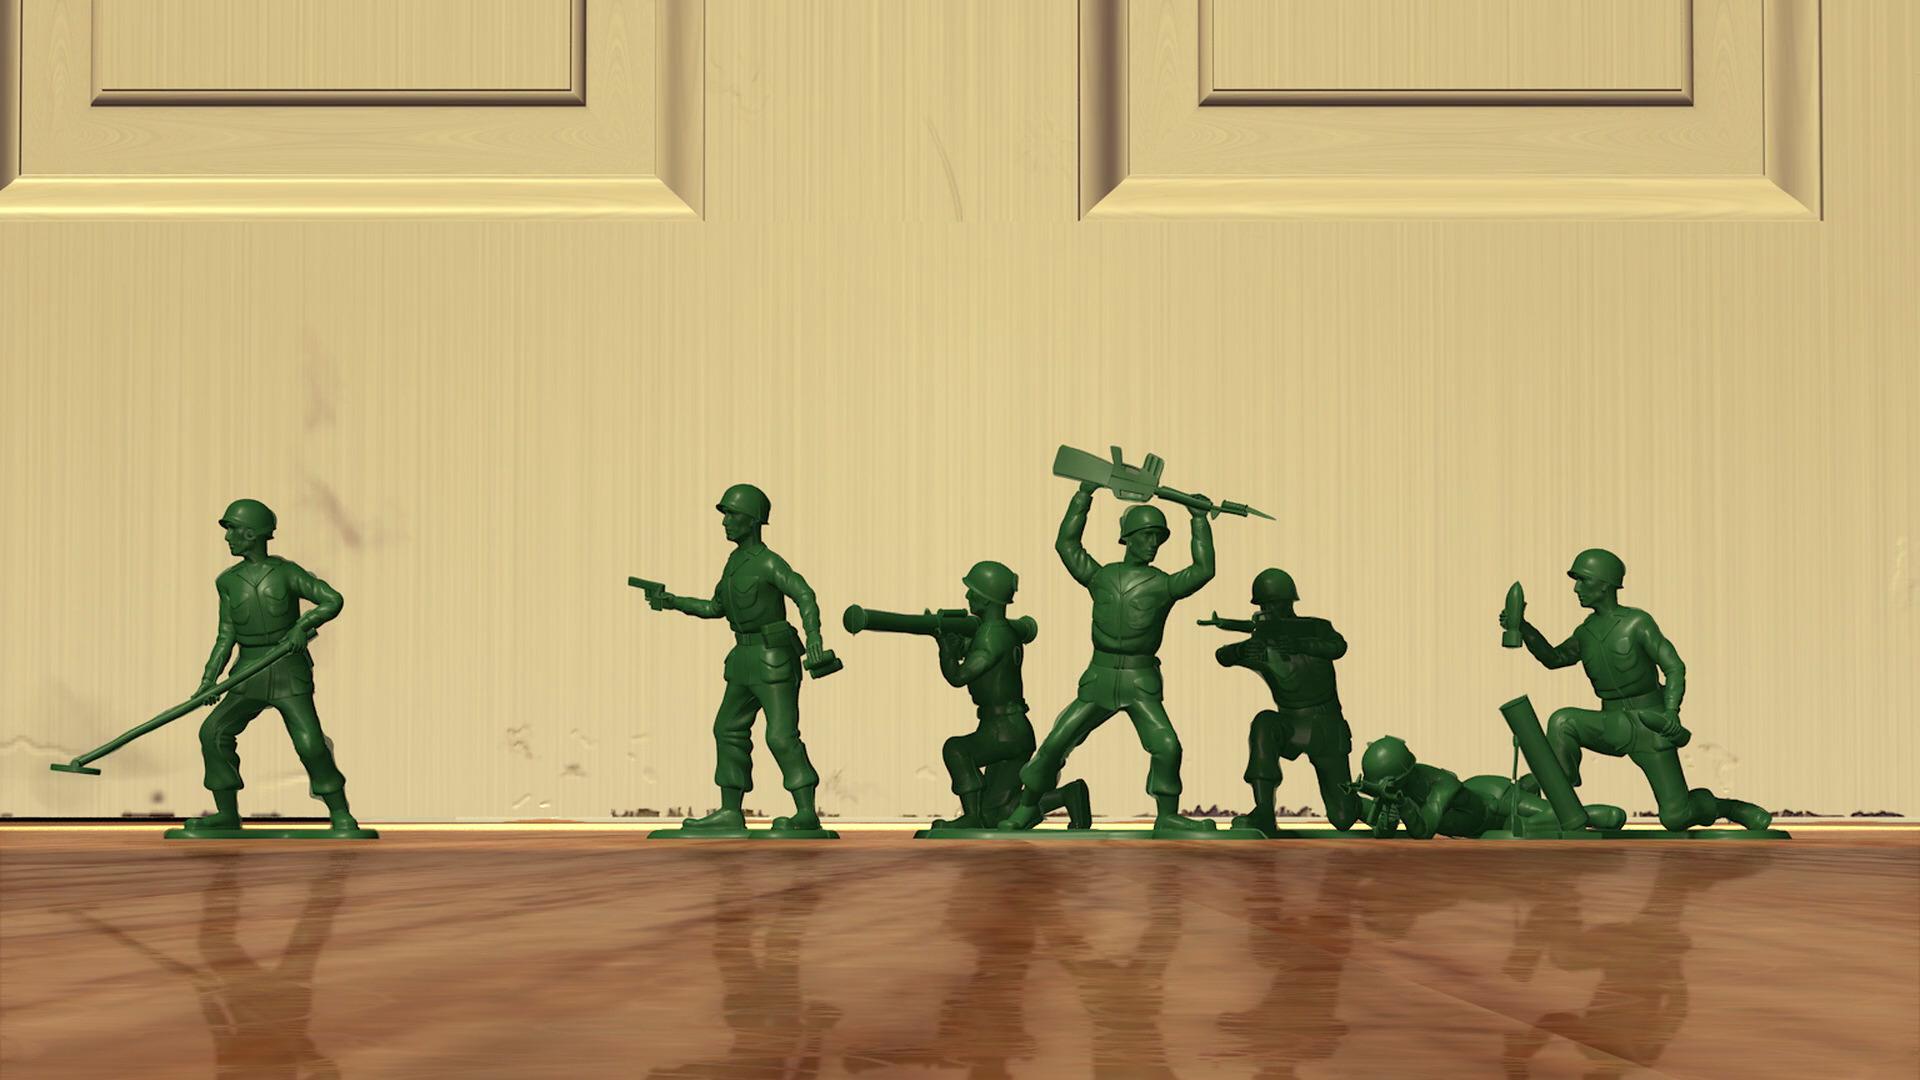 sergent-soldat-vert-personnage-toy-story-04